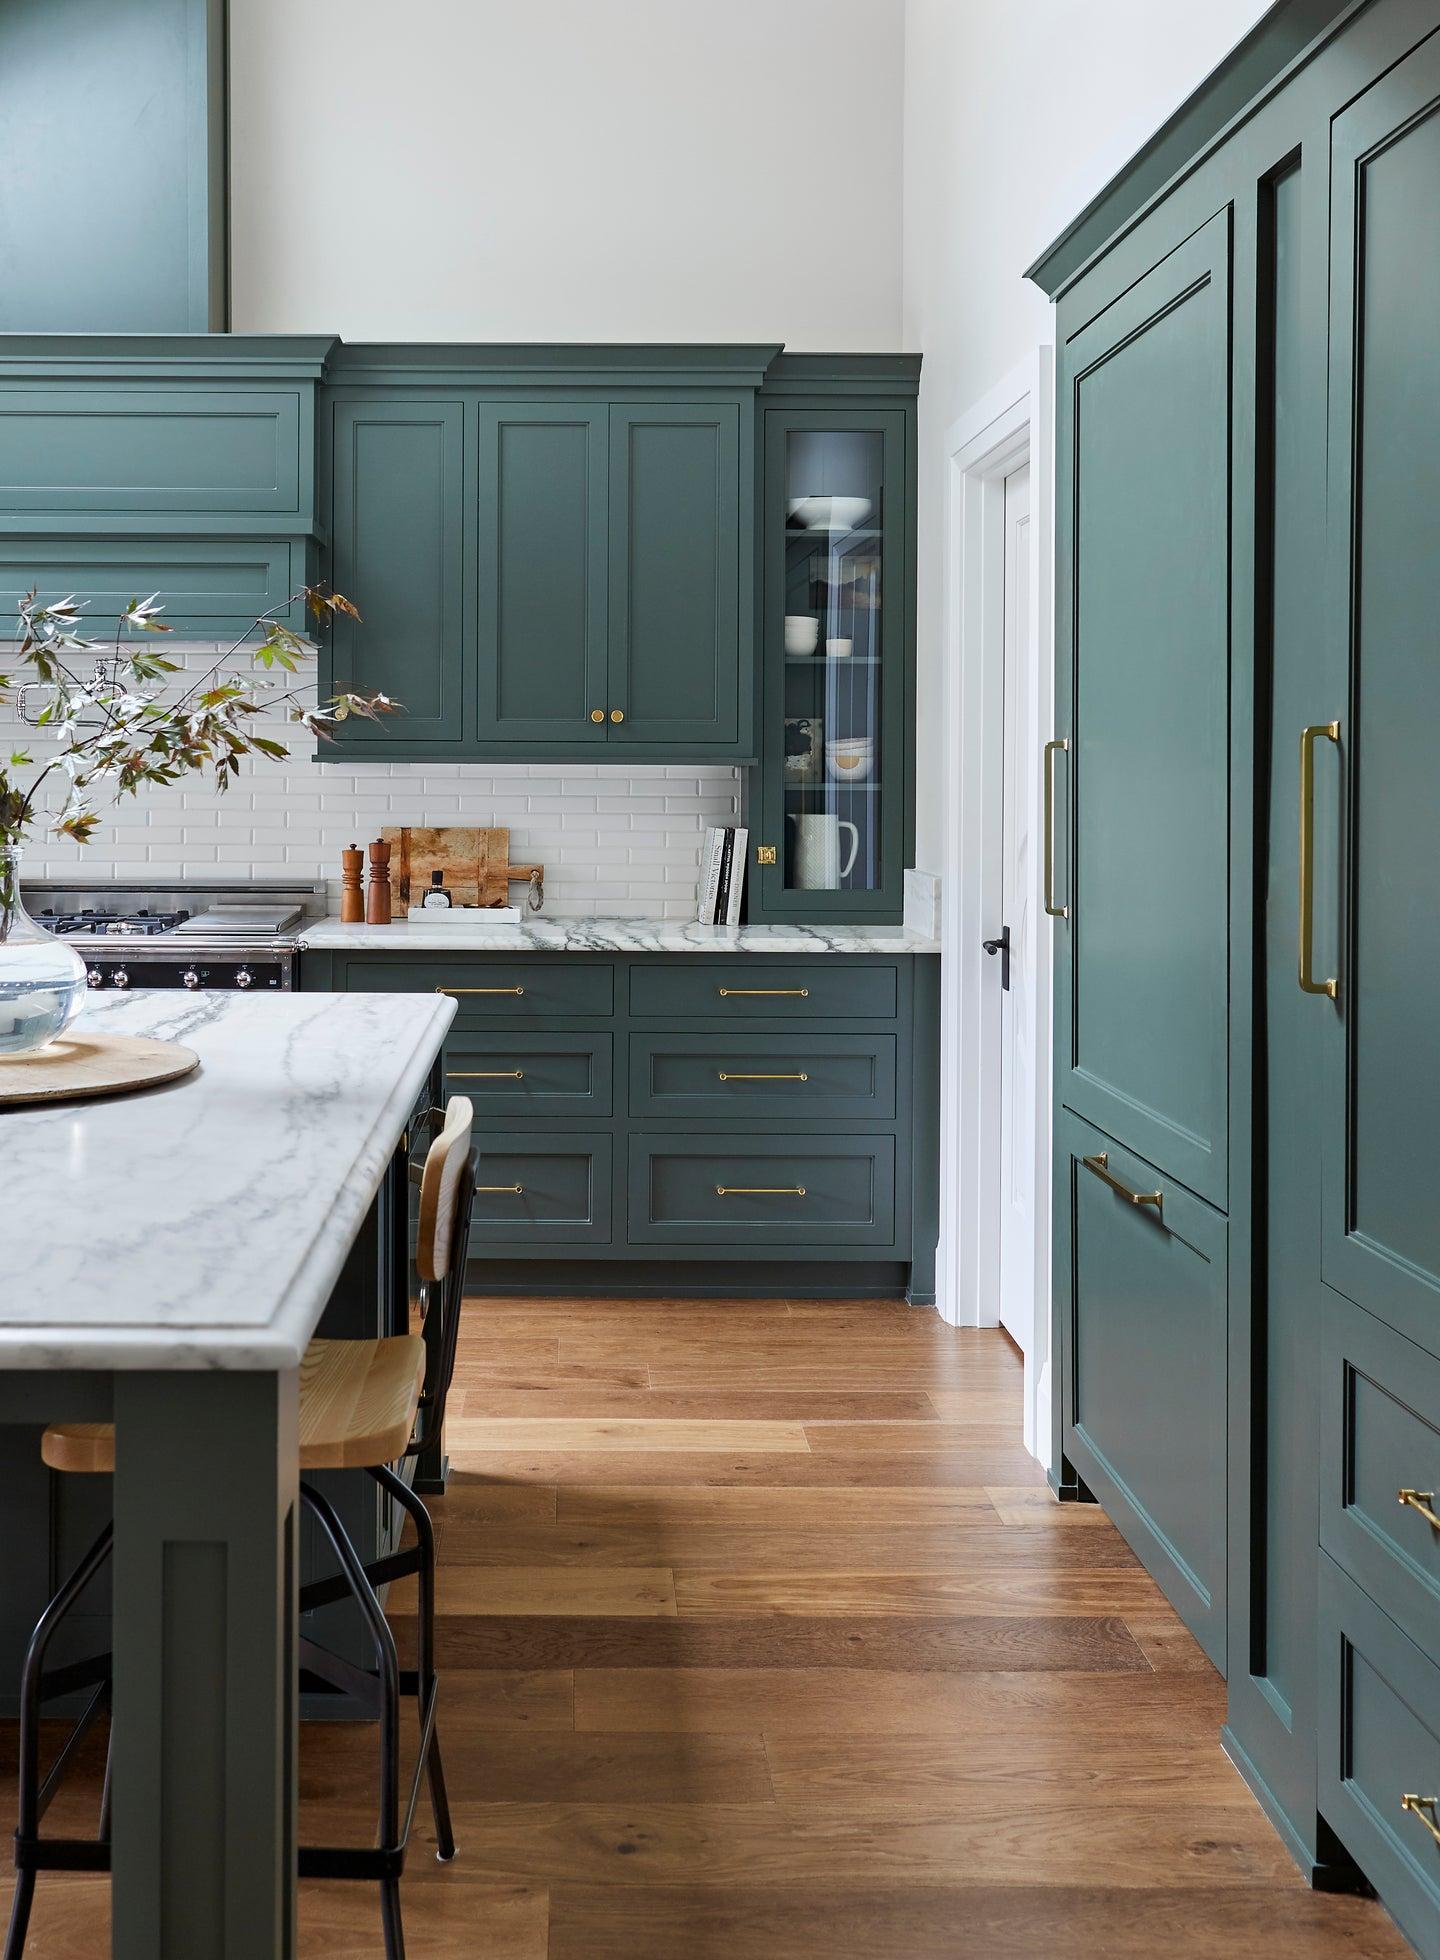 Blue kitchen with hardwood floor